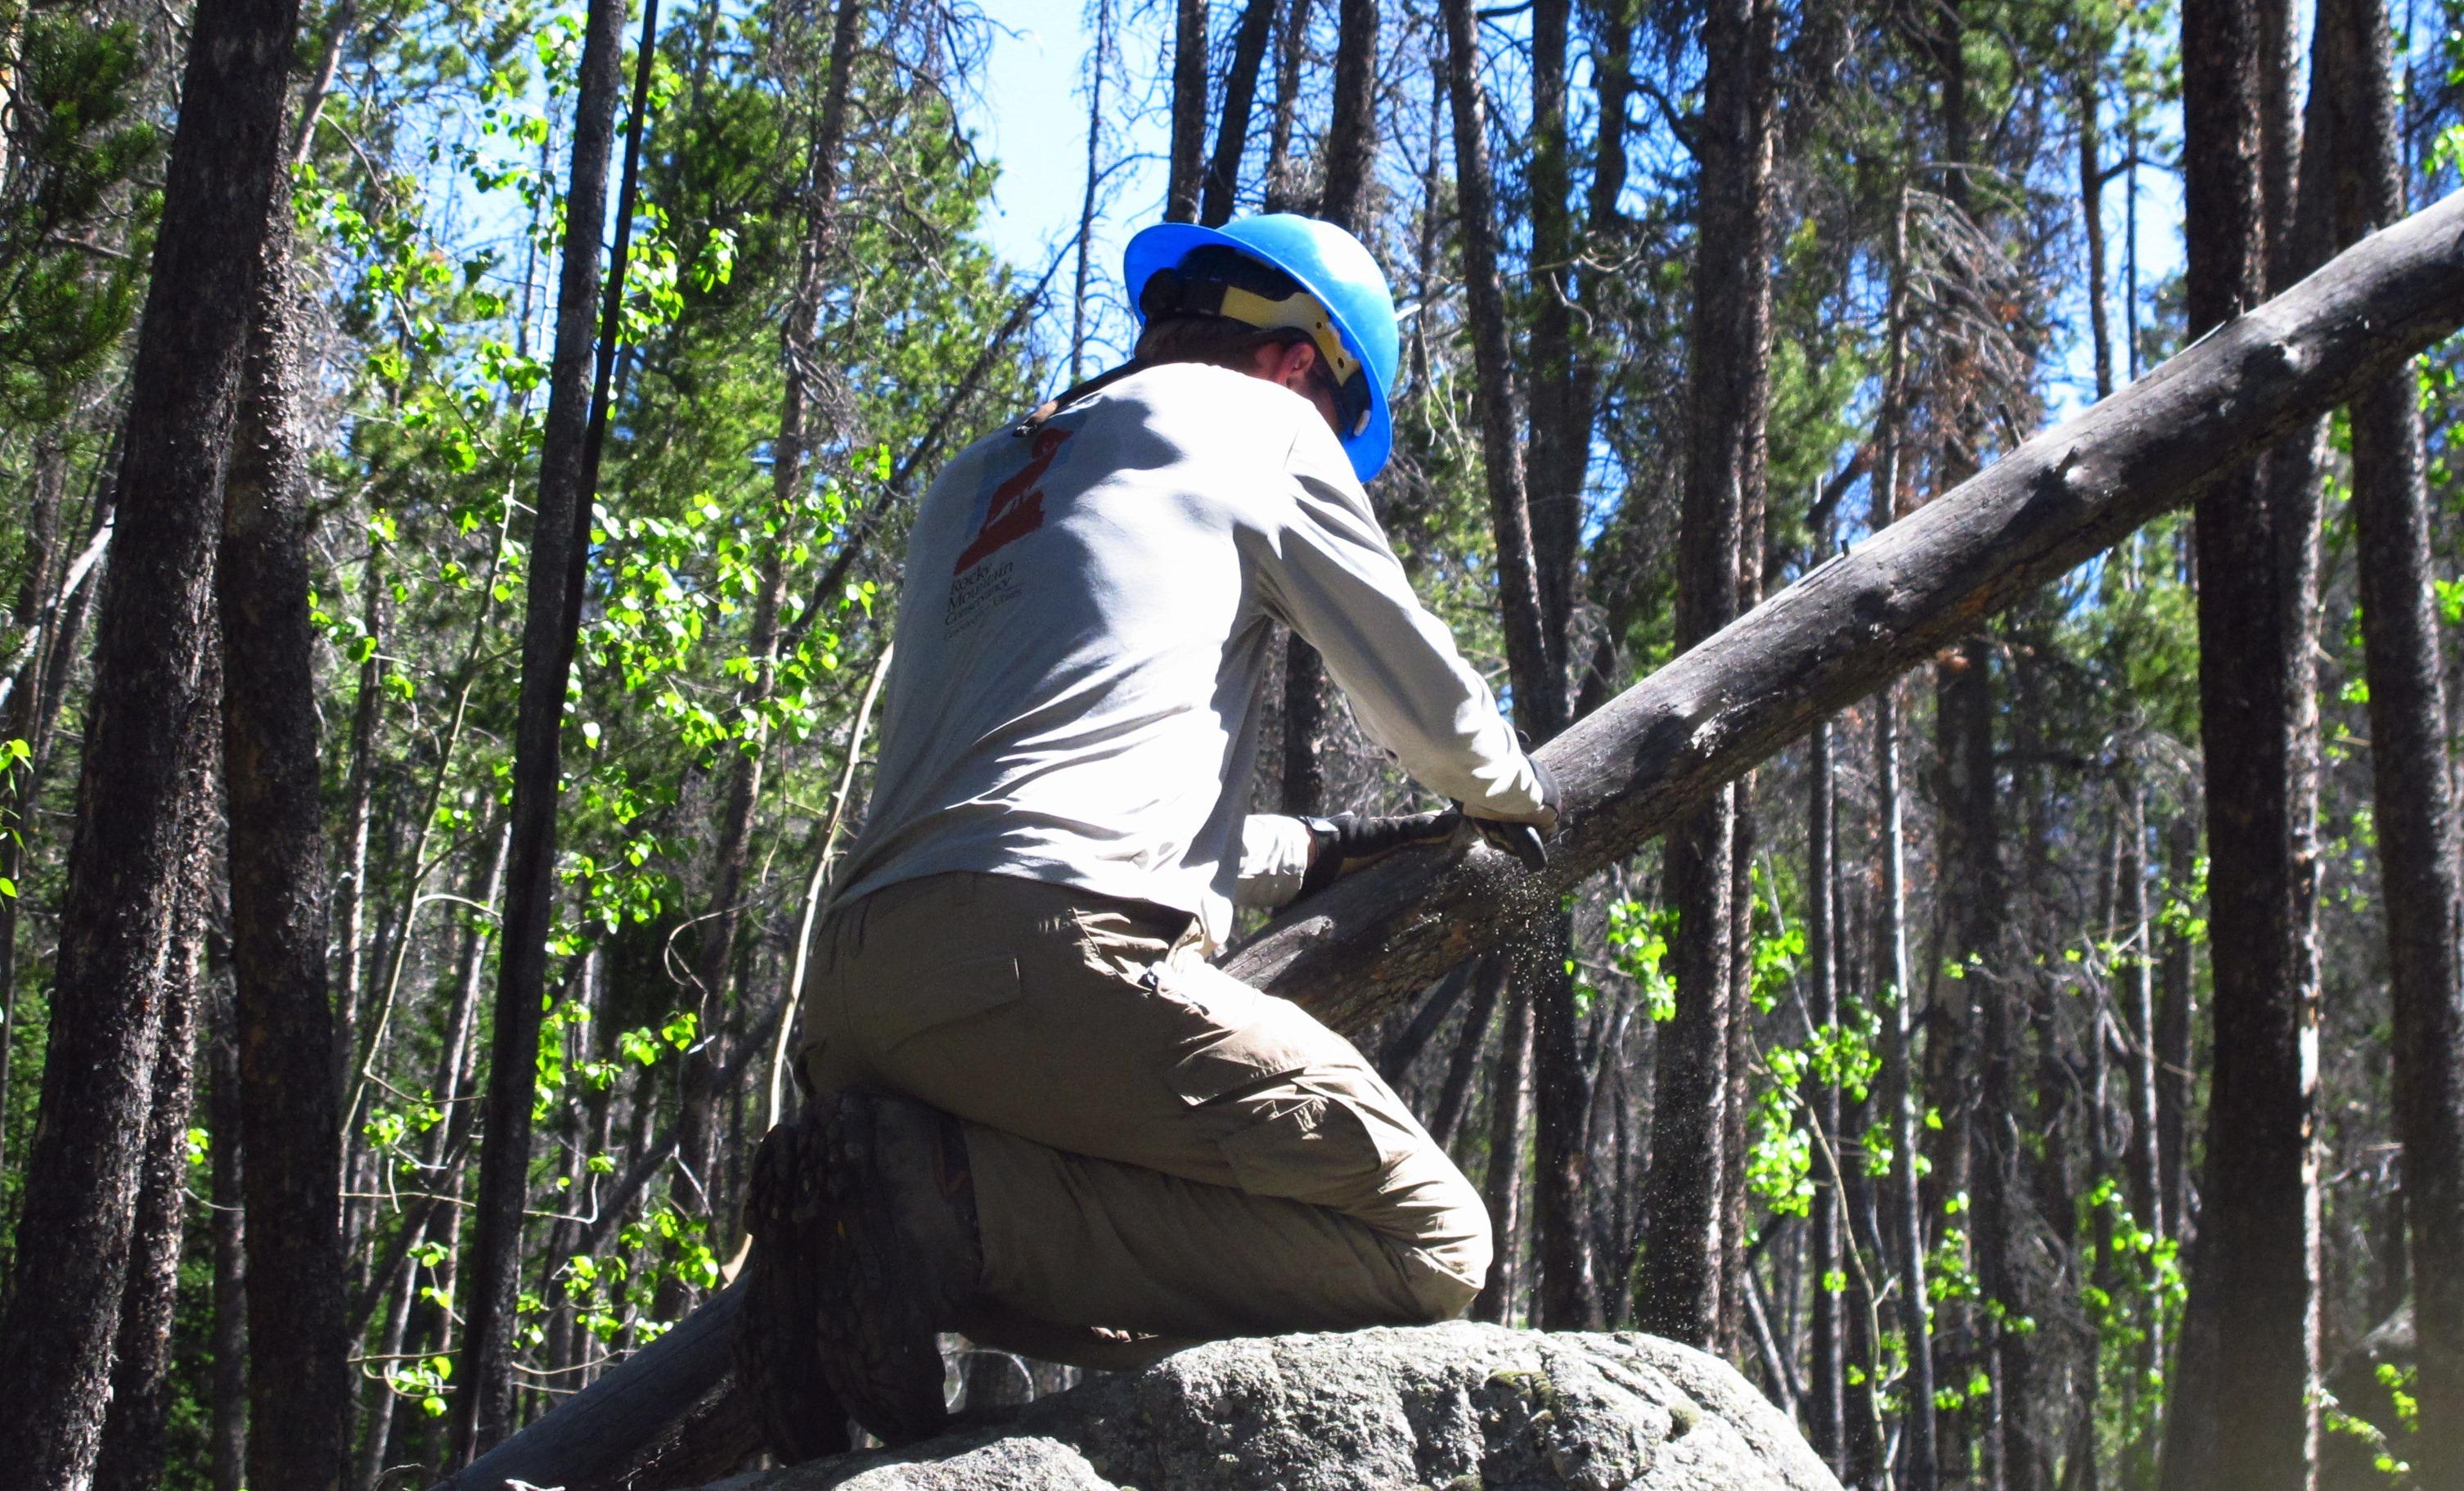 Aidan using the Silky to remove a hazard tree.